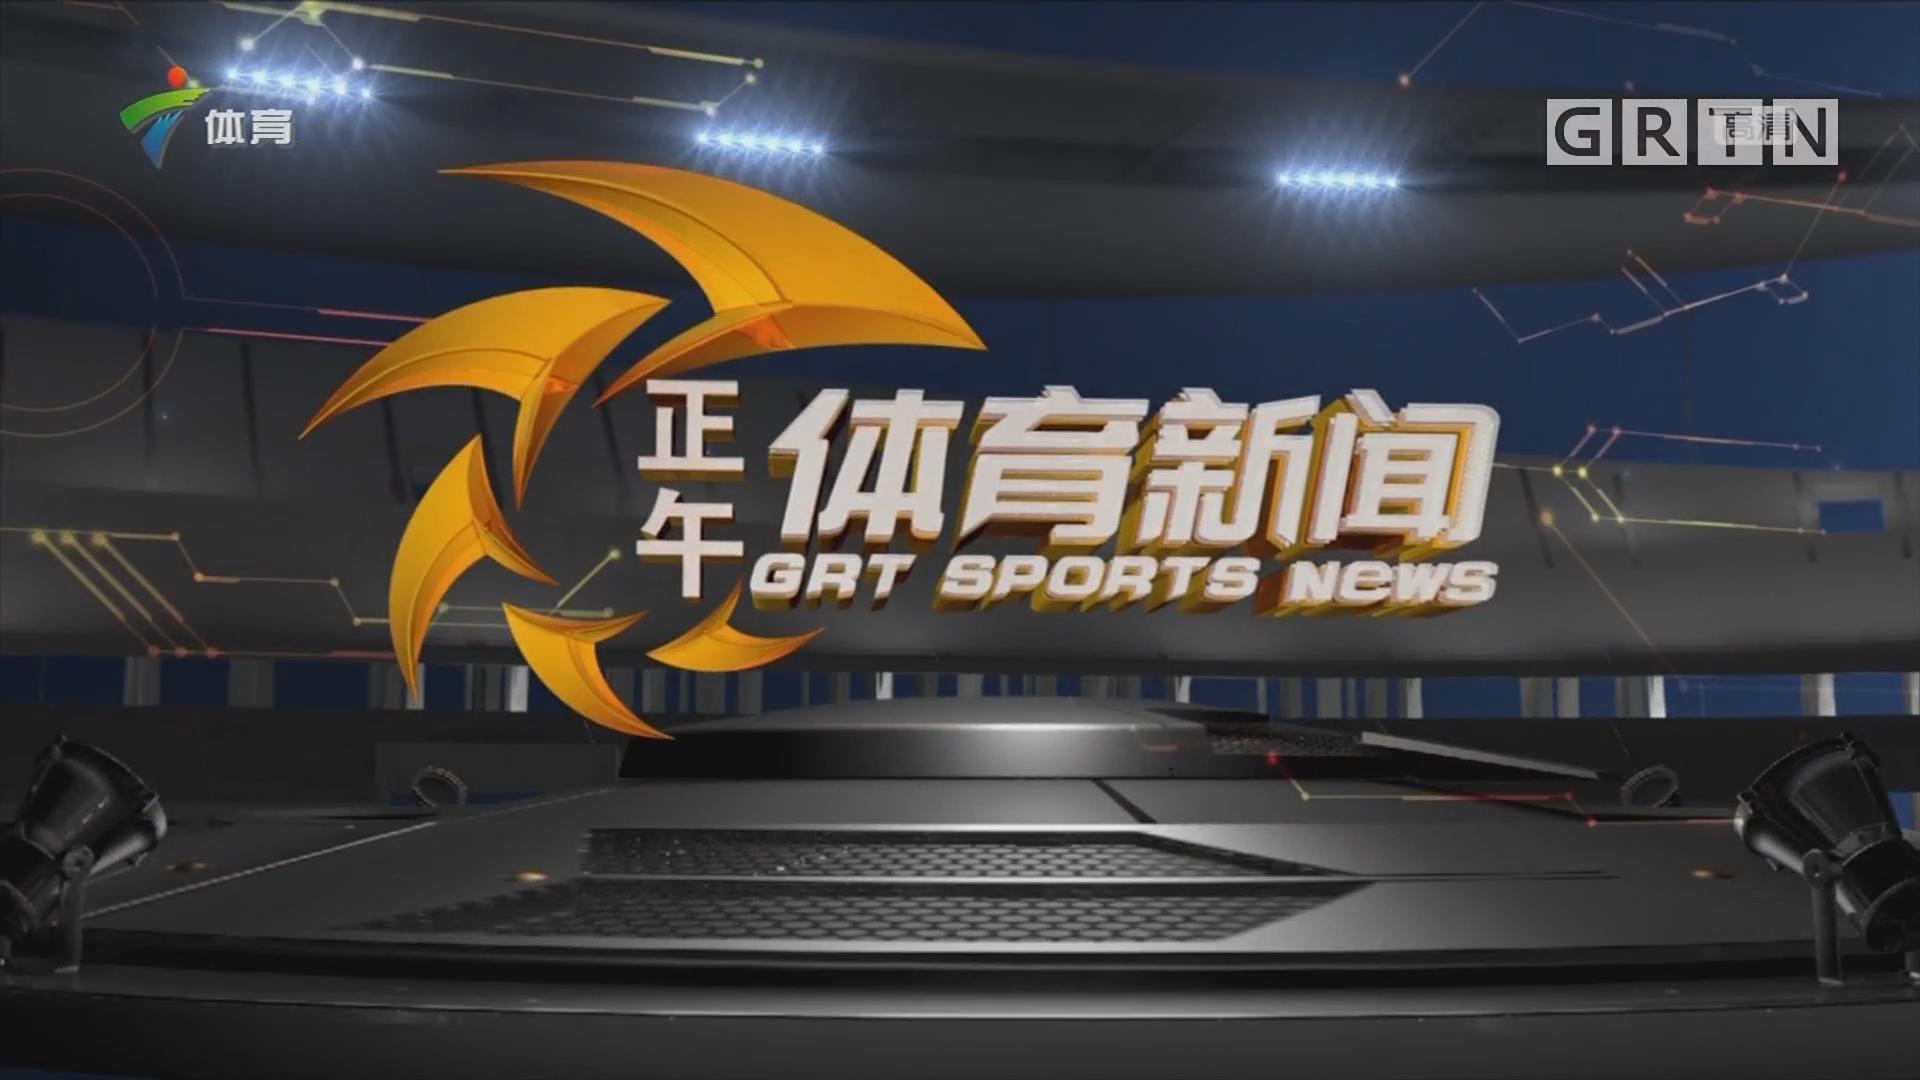 [HD][2019-03-14]正午体育新闻:广东德比深圳告负 锁定常规赛第四